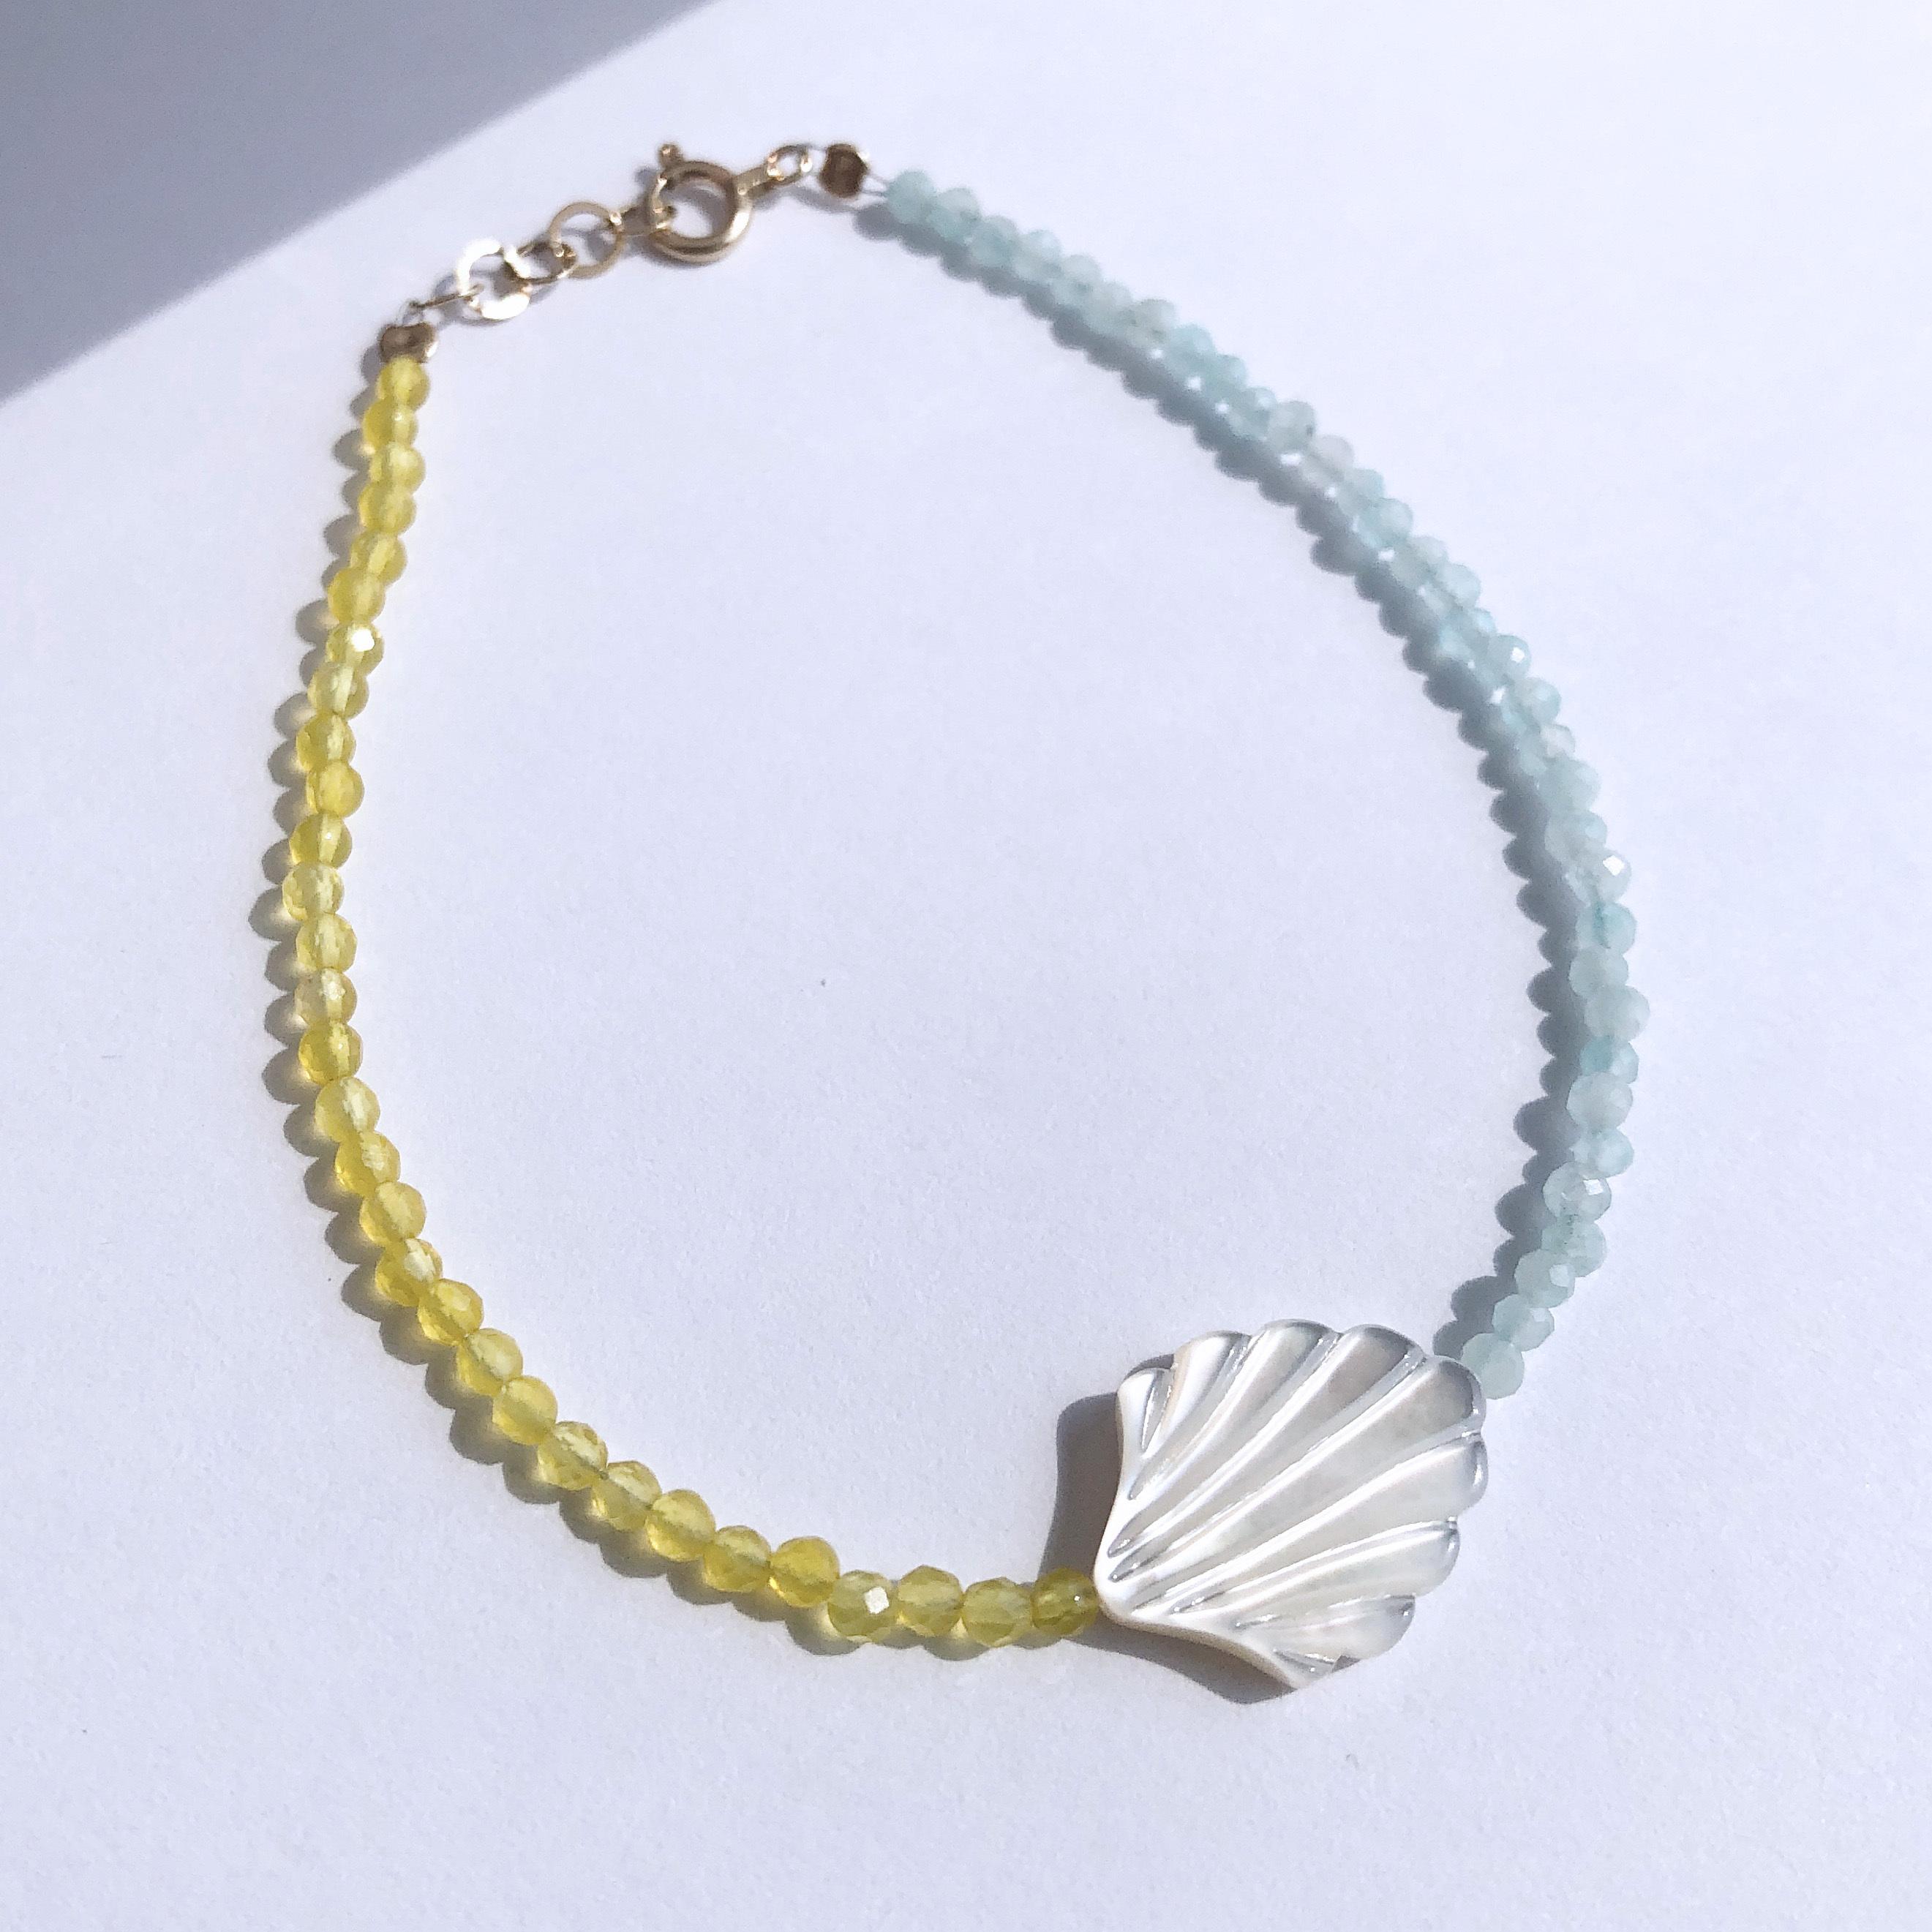 K10YG Mother of Pearl x Agate x Amazonite Bracelet / チャリティージュエリー